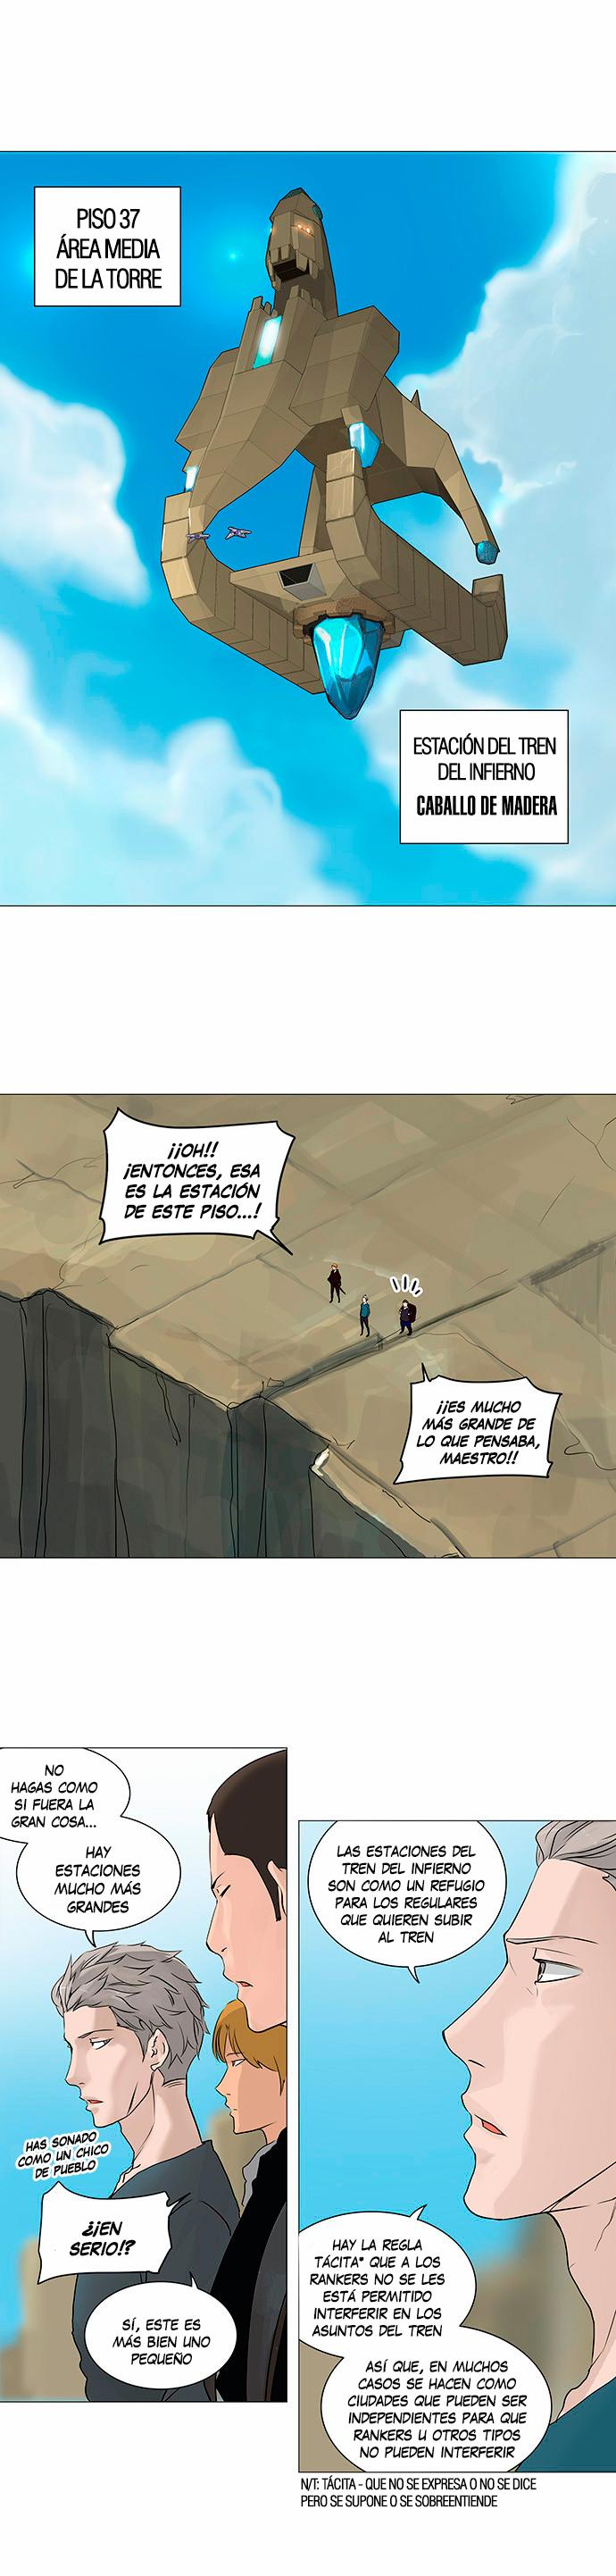 http://c5.ninemanga.com/es_manga/21/149/391707/8631f219500638a09ee08a3033f25f43.jpg Page 2